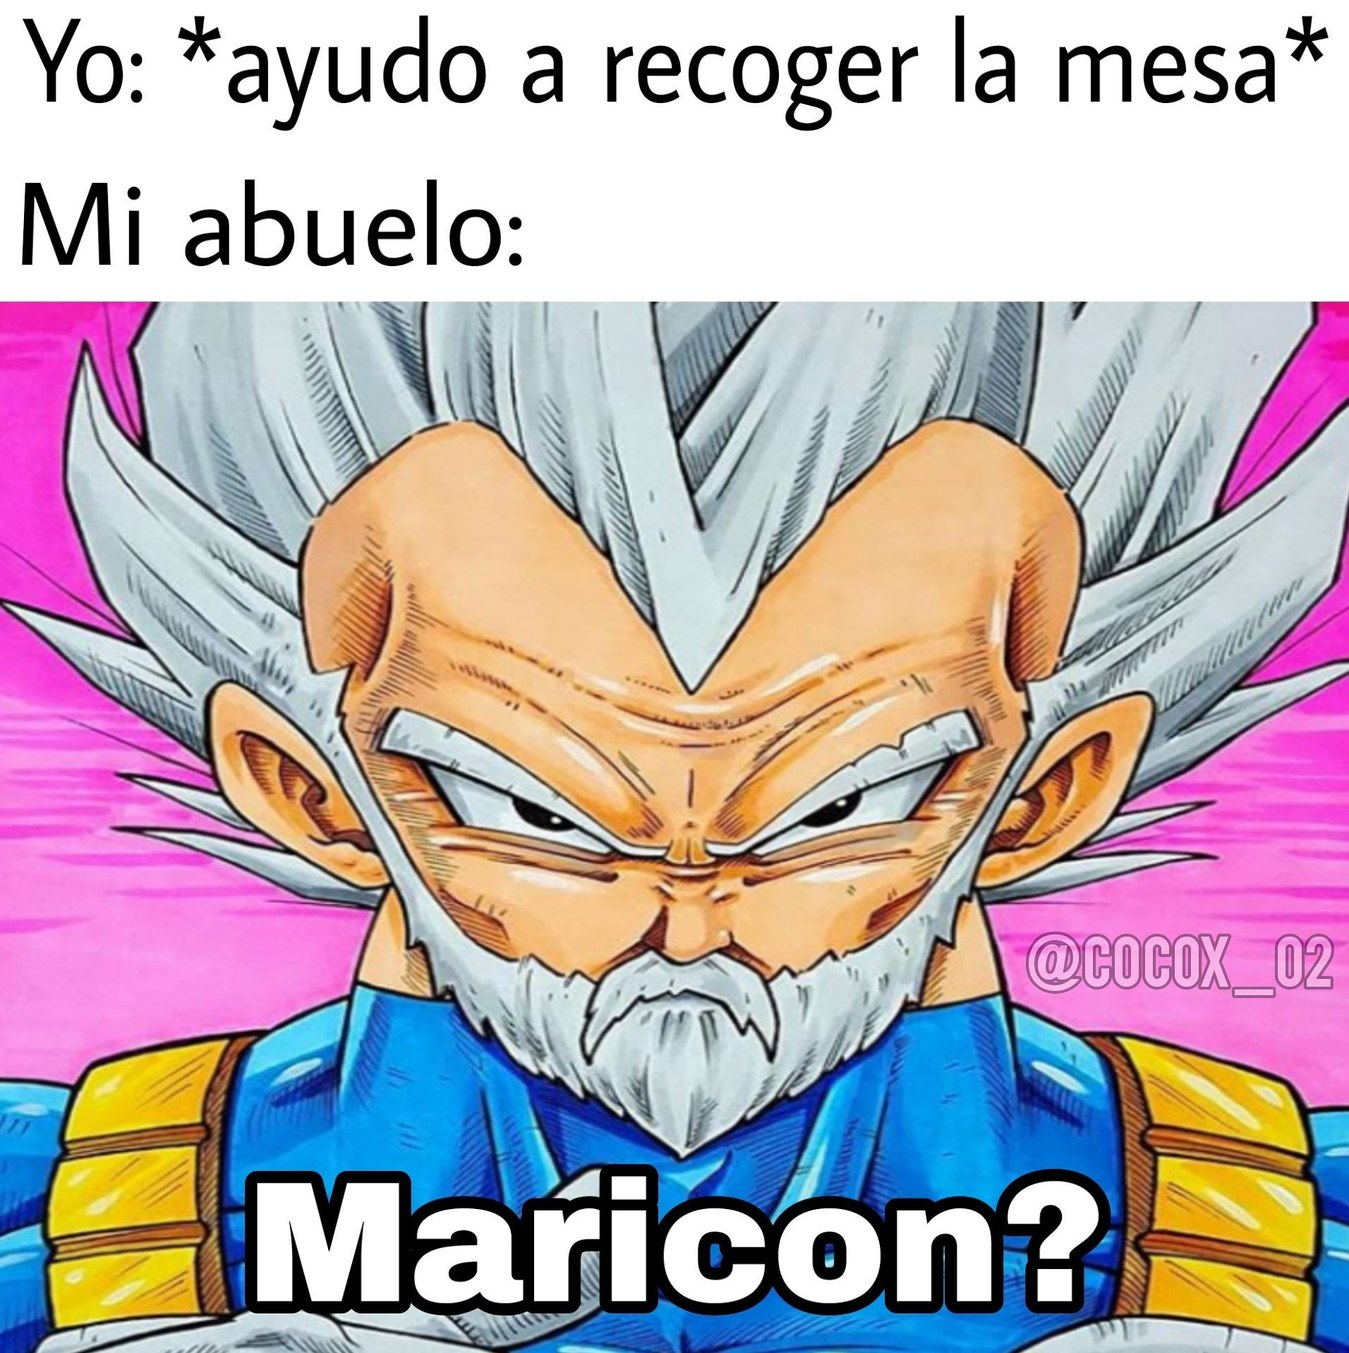 Maricon - meme